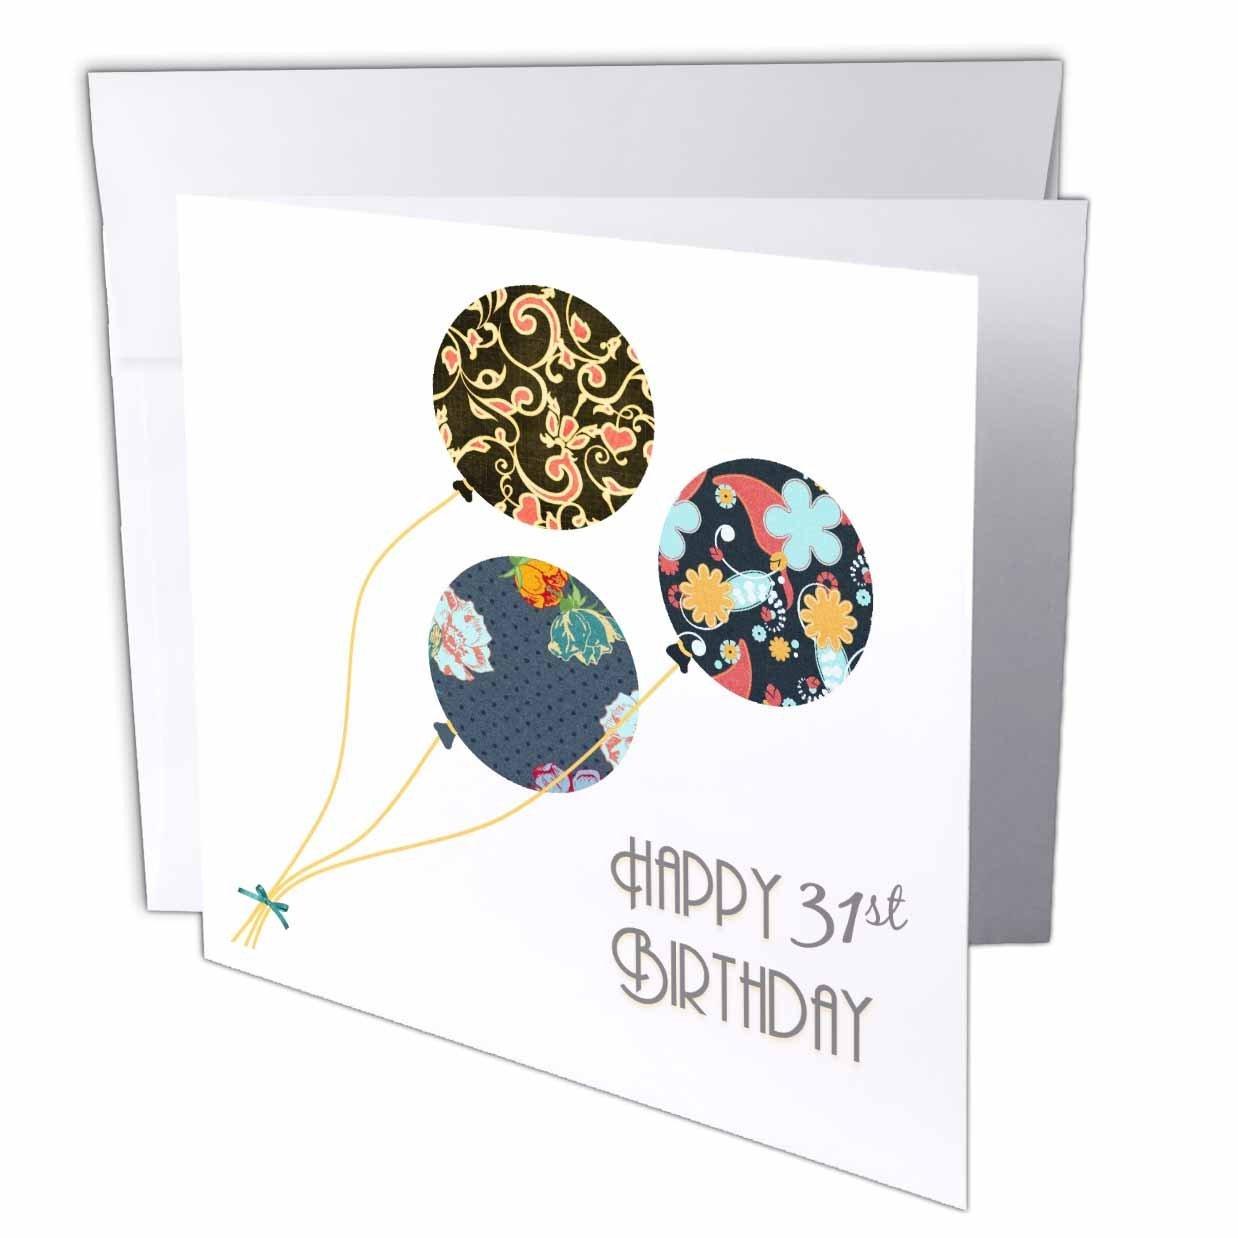 Buy Inspirationzstore Occasions Happy 31st Birthday Modern